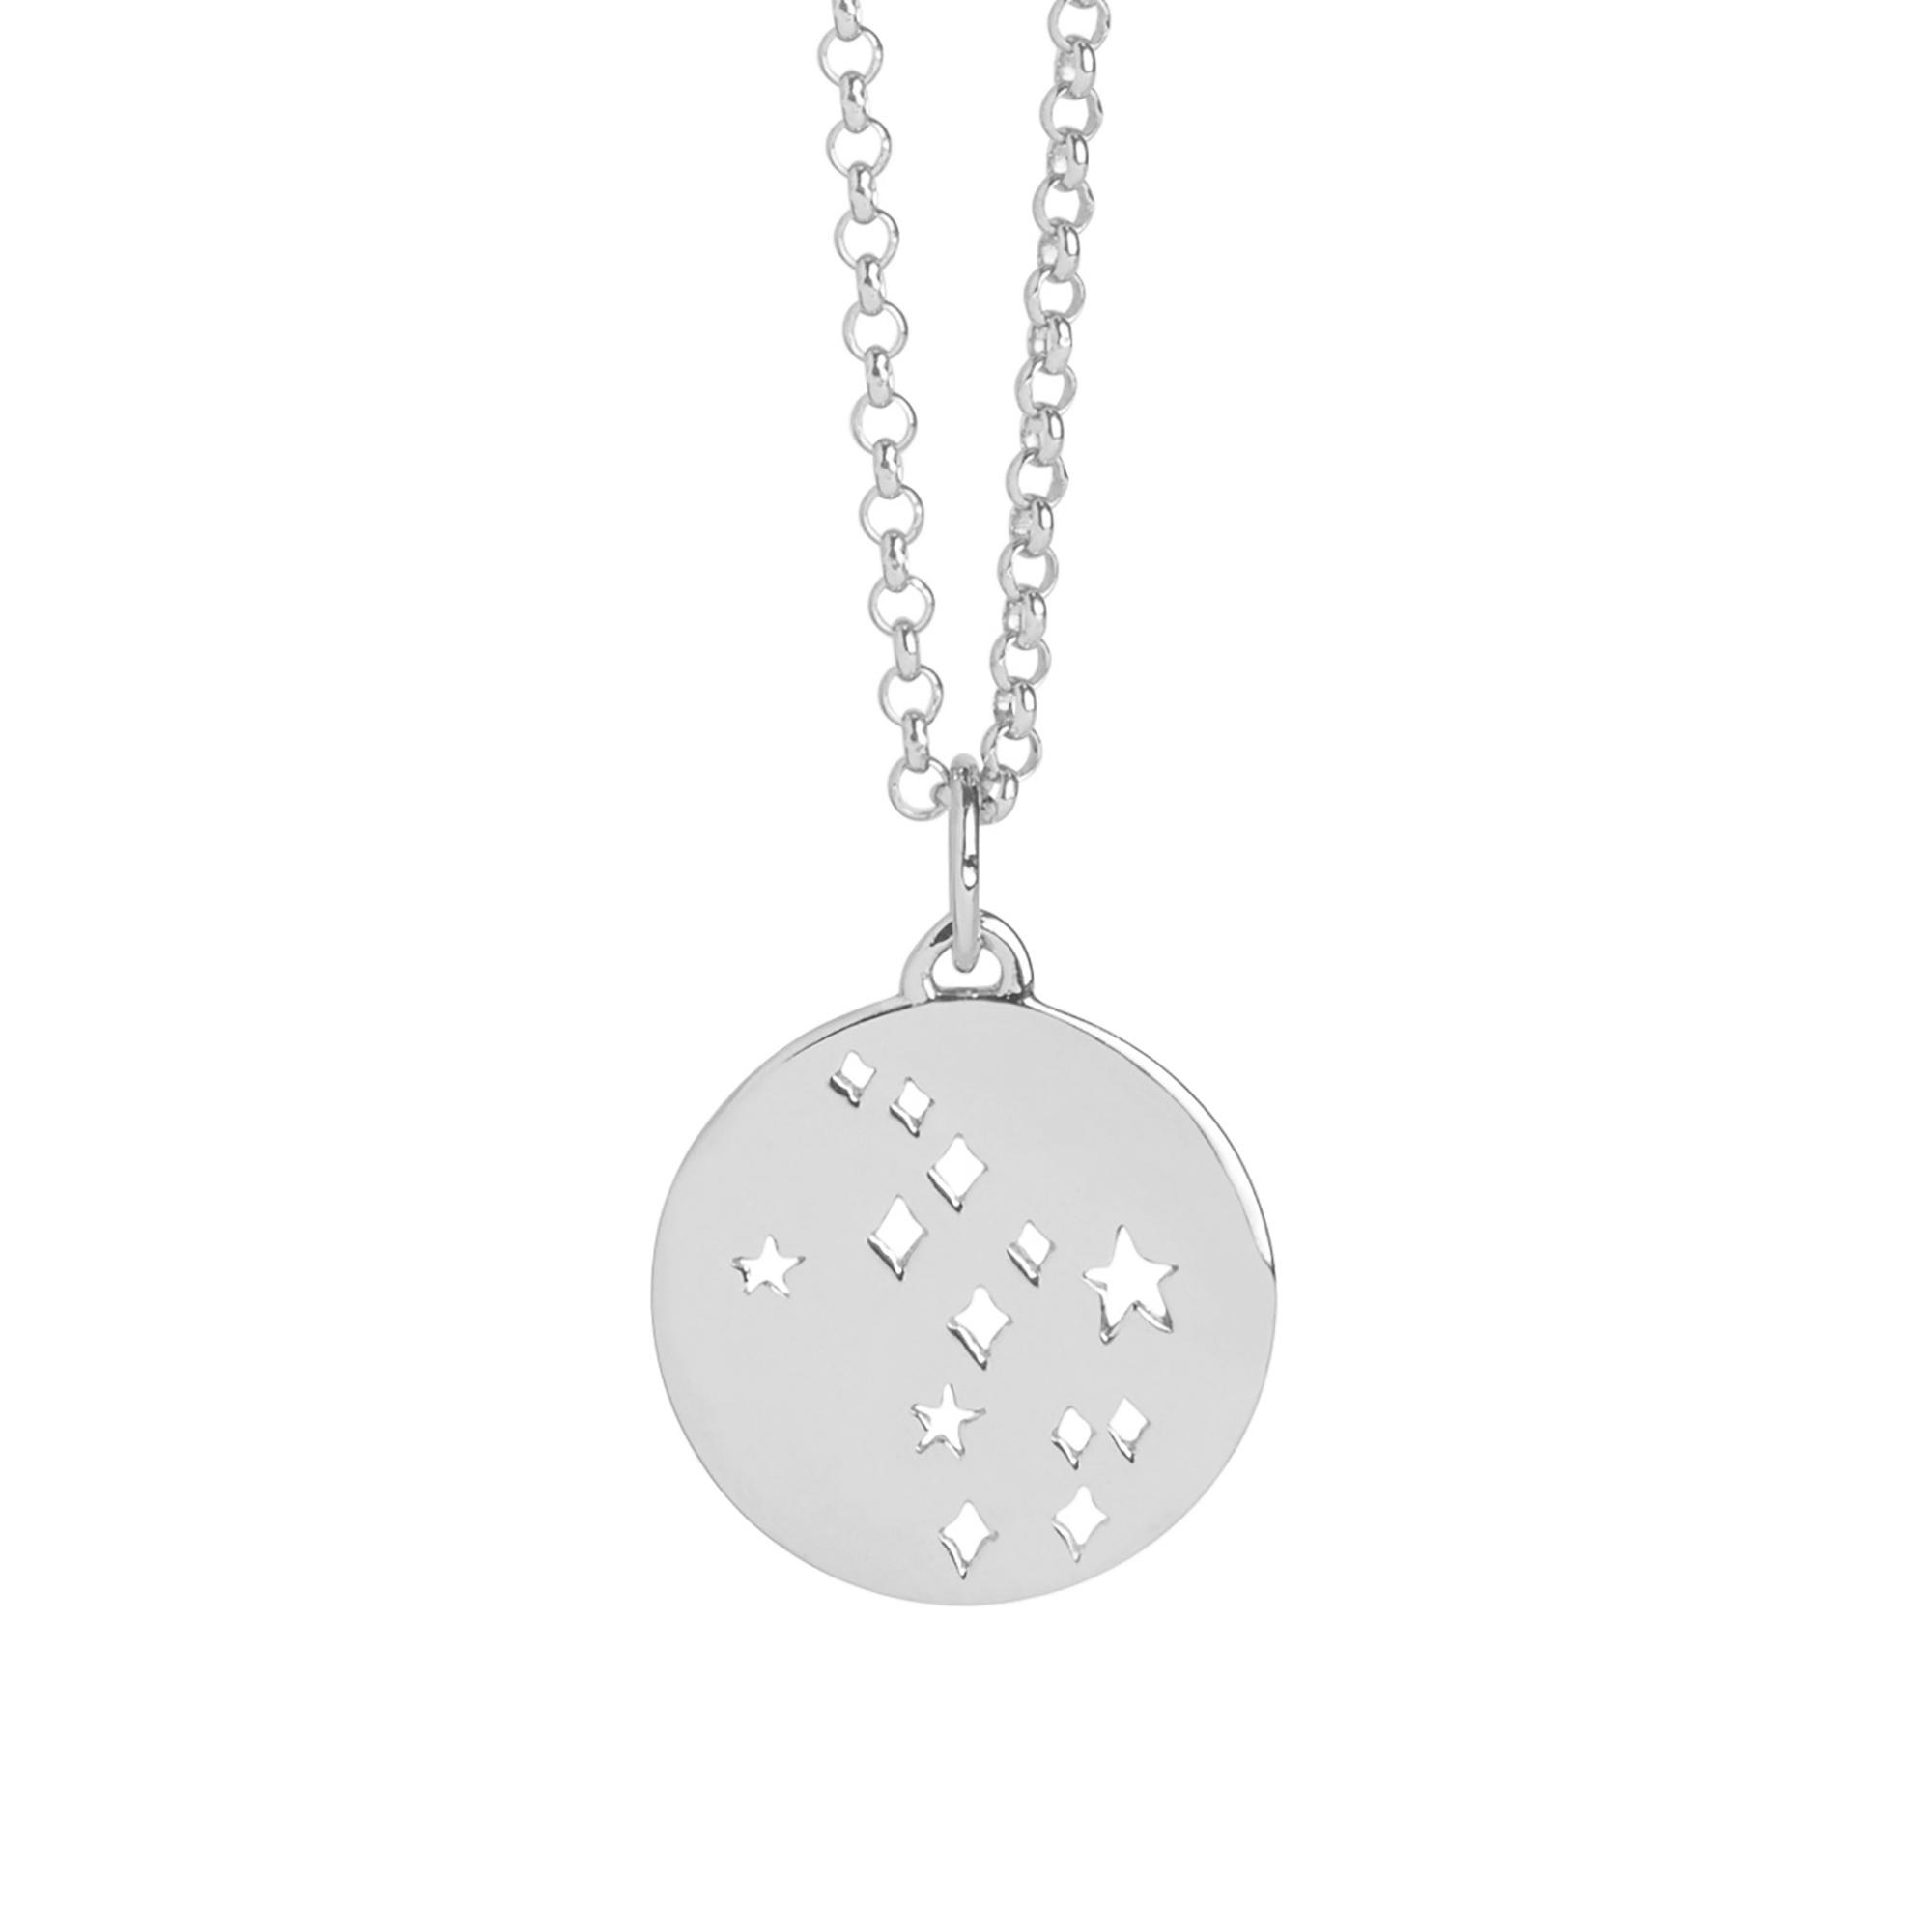 Muru Virgo Star Sign Necklace Silver